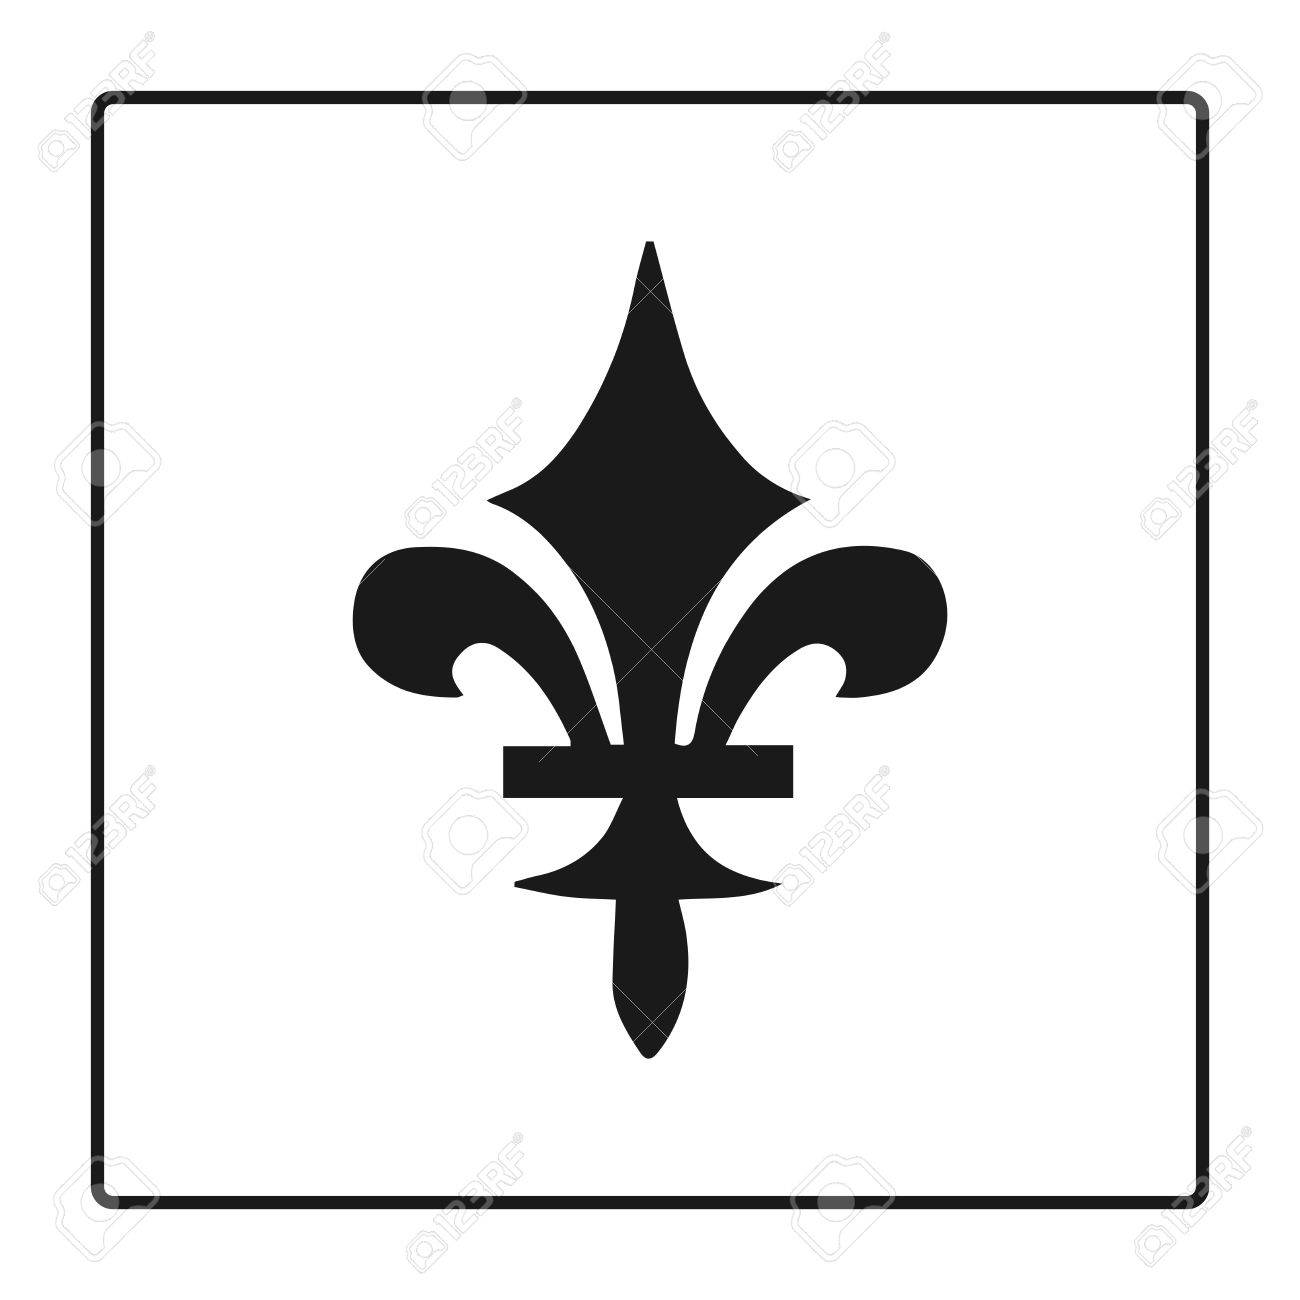 Fleur de lis symbol silhouette heraldic symbol vector fleur de lis symbol silhouette heraldic symbol vector illustration medieval sign biocorpaavc Gallery